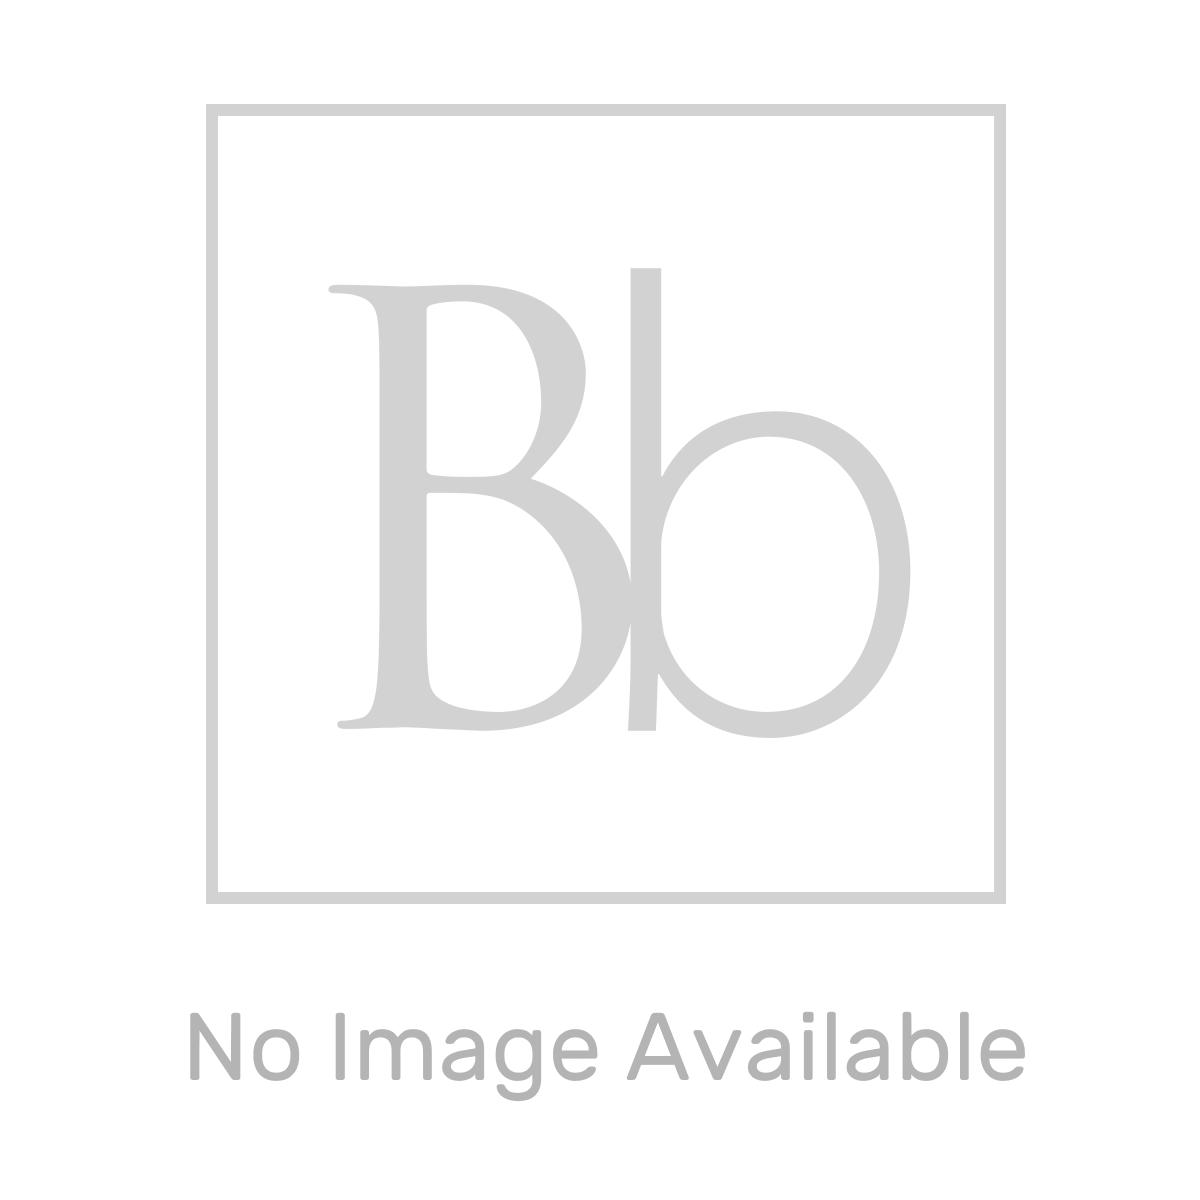 Sensio Ainsley Single Door LED Cabinet Mirror 700 x 564 x 126 1